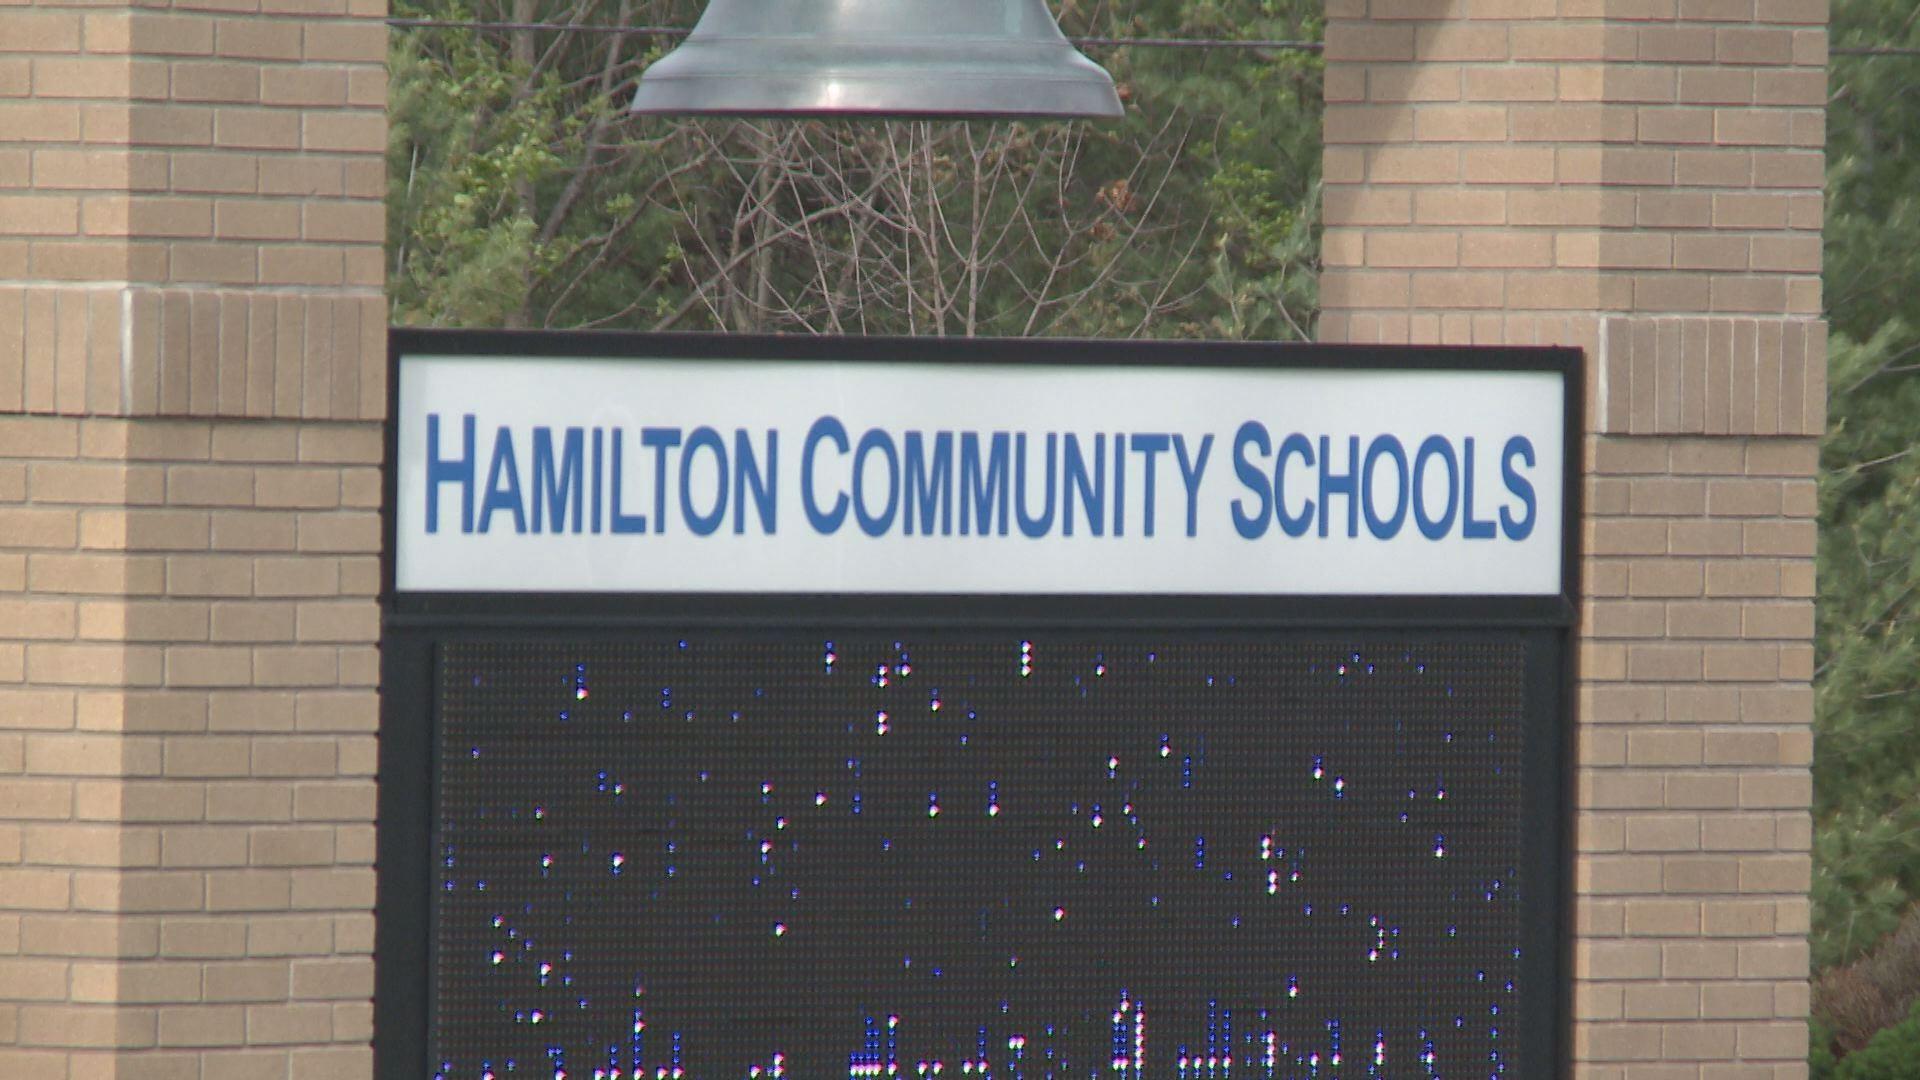 Hamilton Community Schools_112760